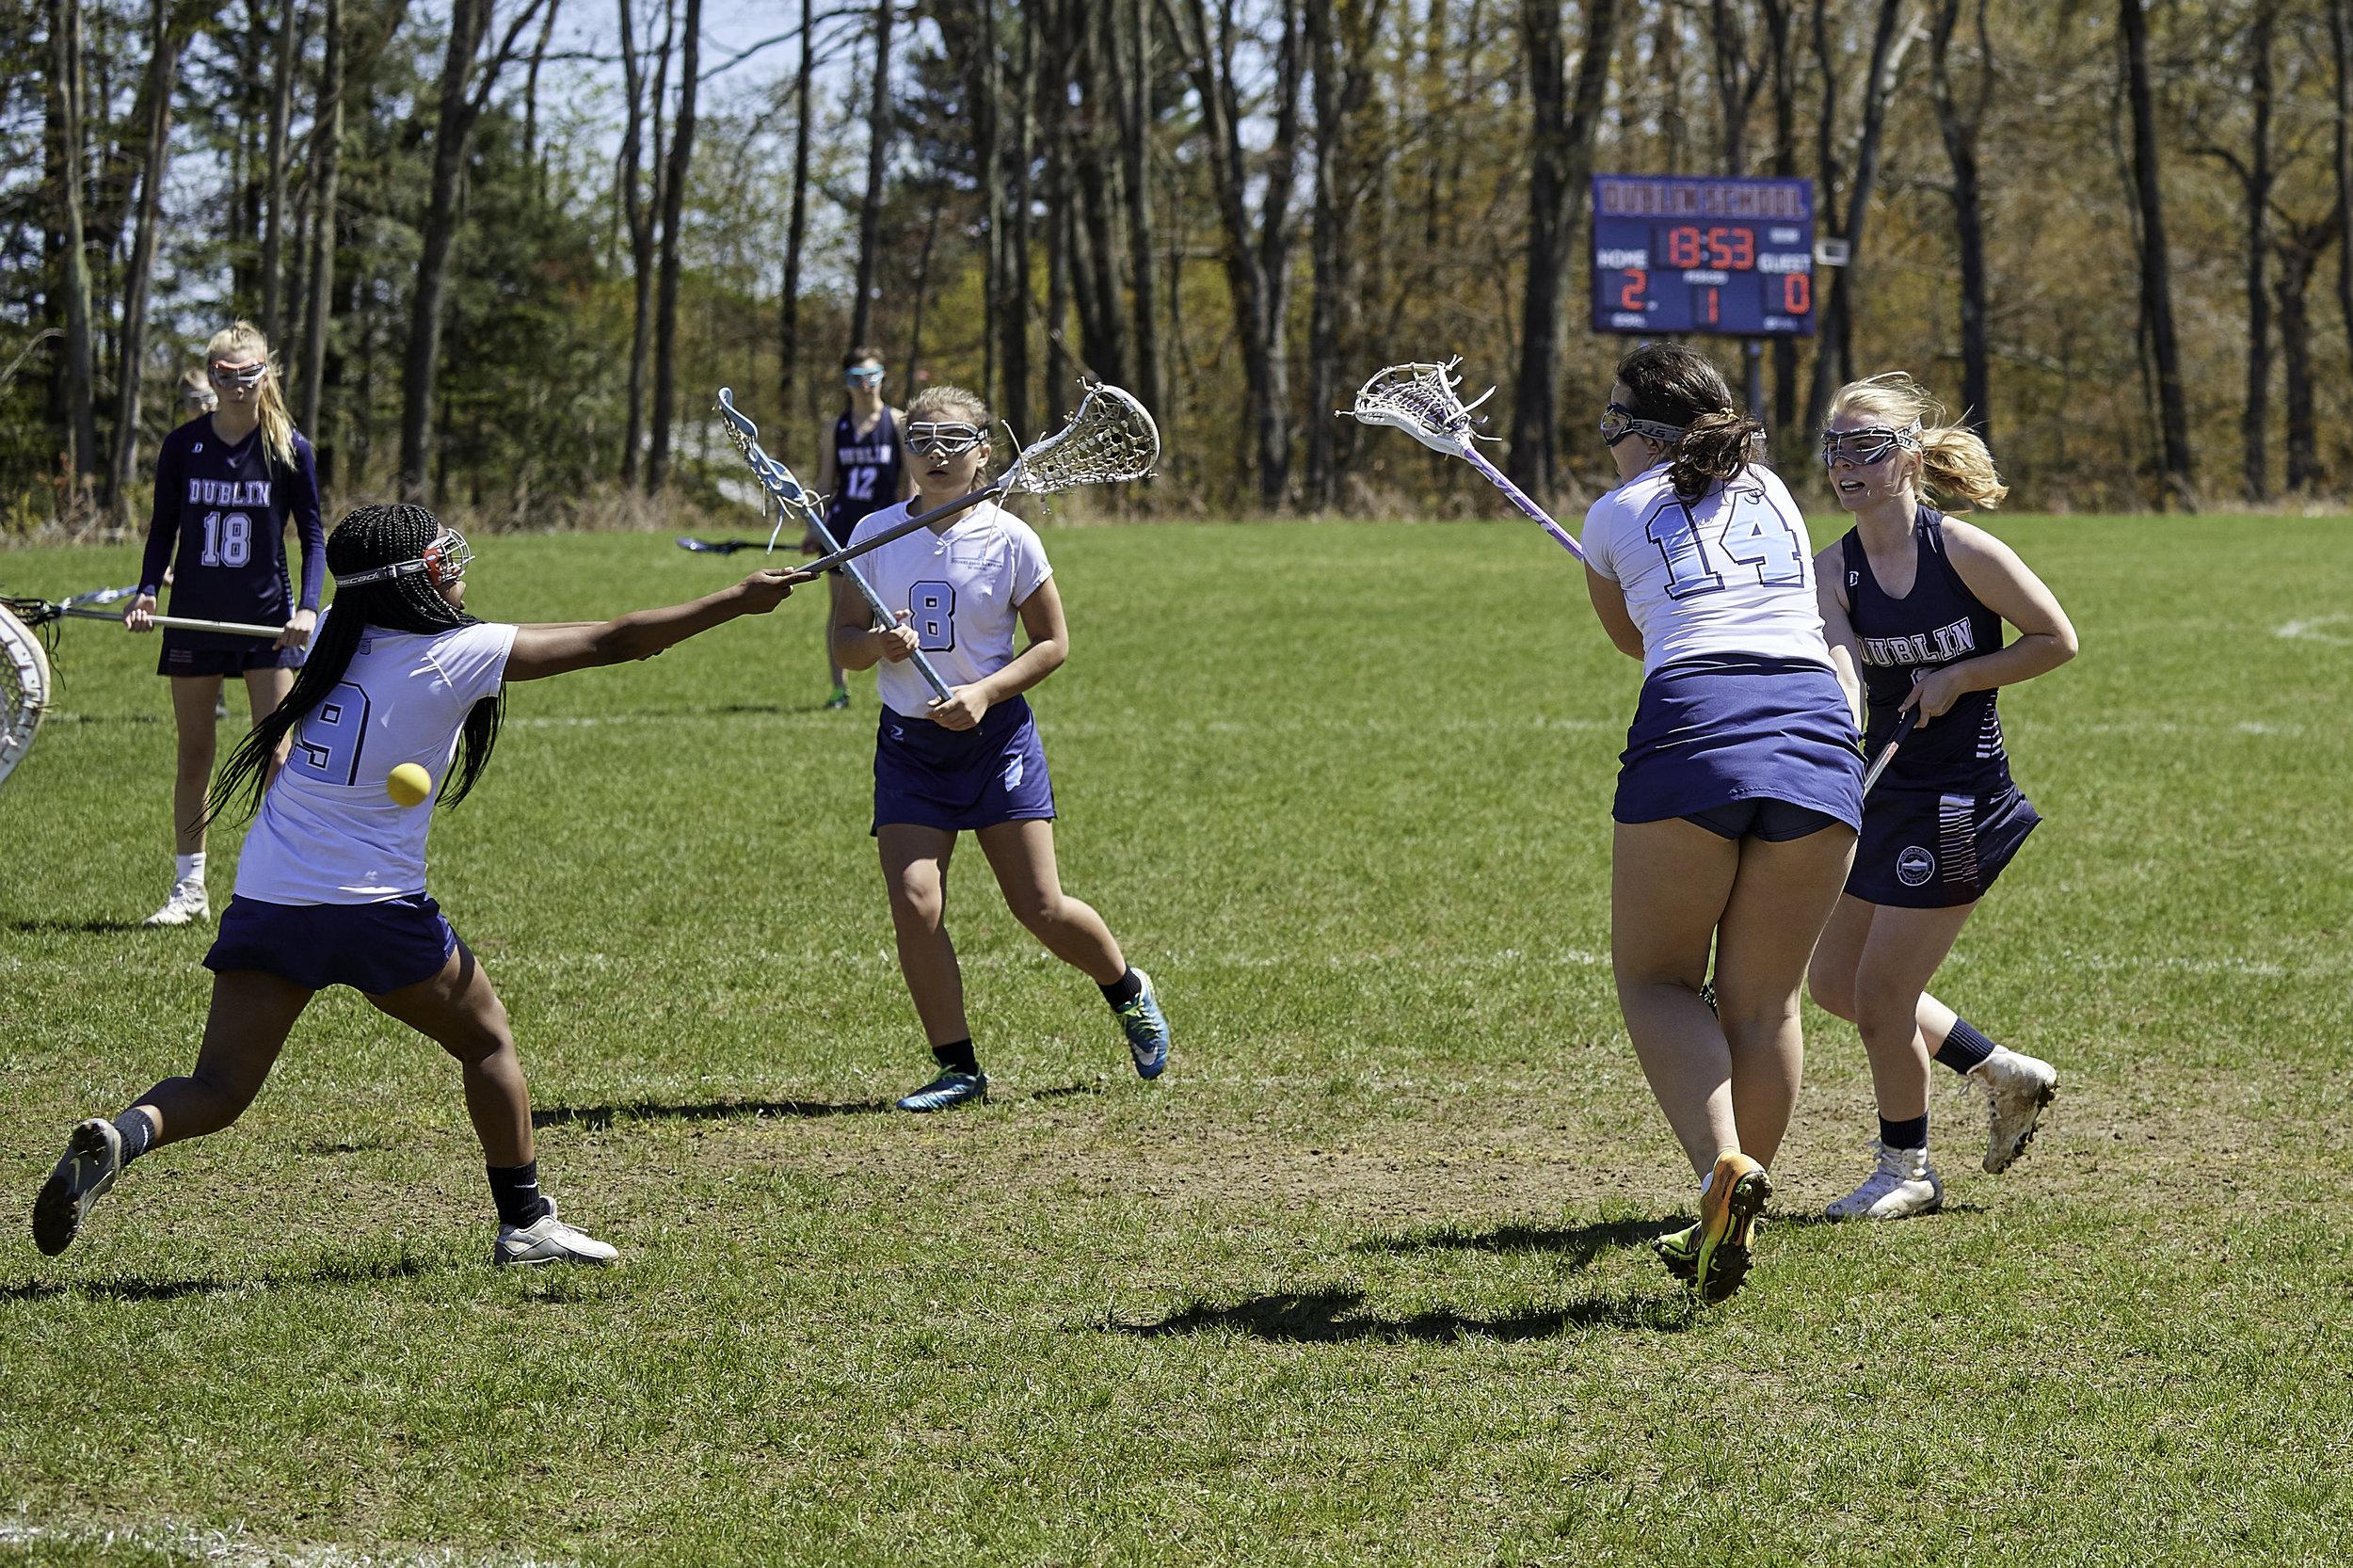 Girls Lacrosse vs. Stoneleigh Burnham School - May 11, 2019 - May 10, 2019193194.jpg